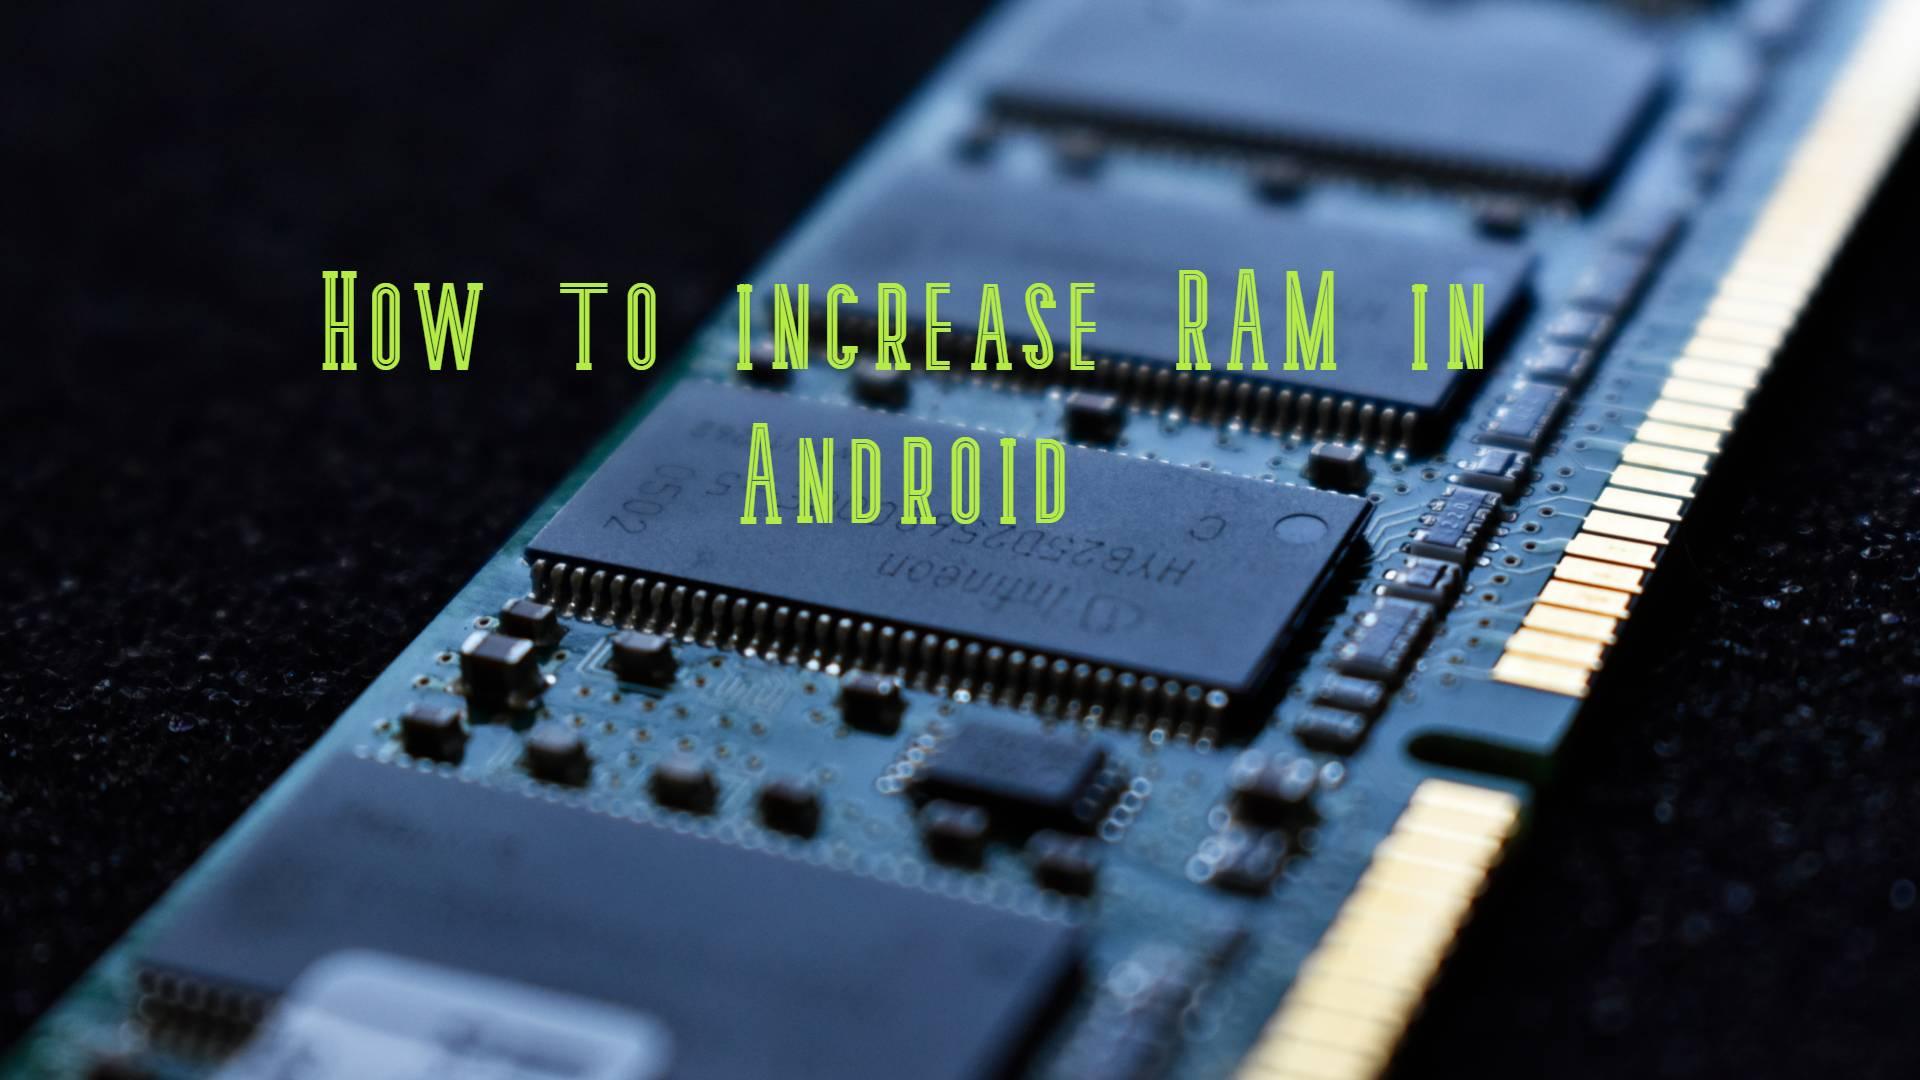 RAM Chip Image